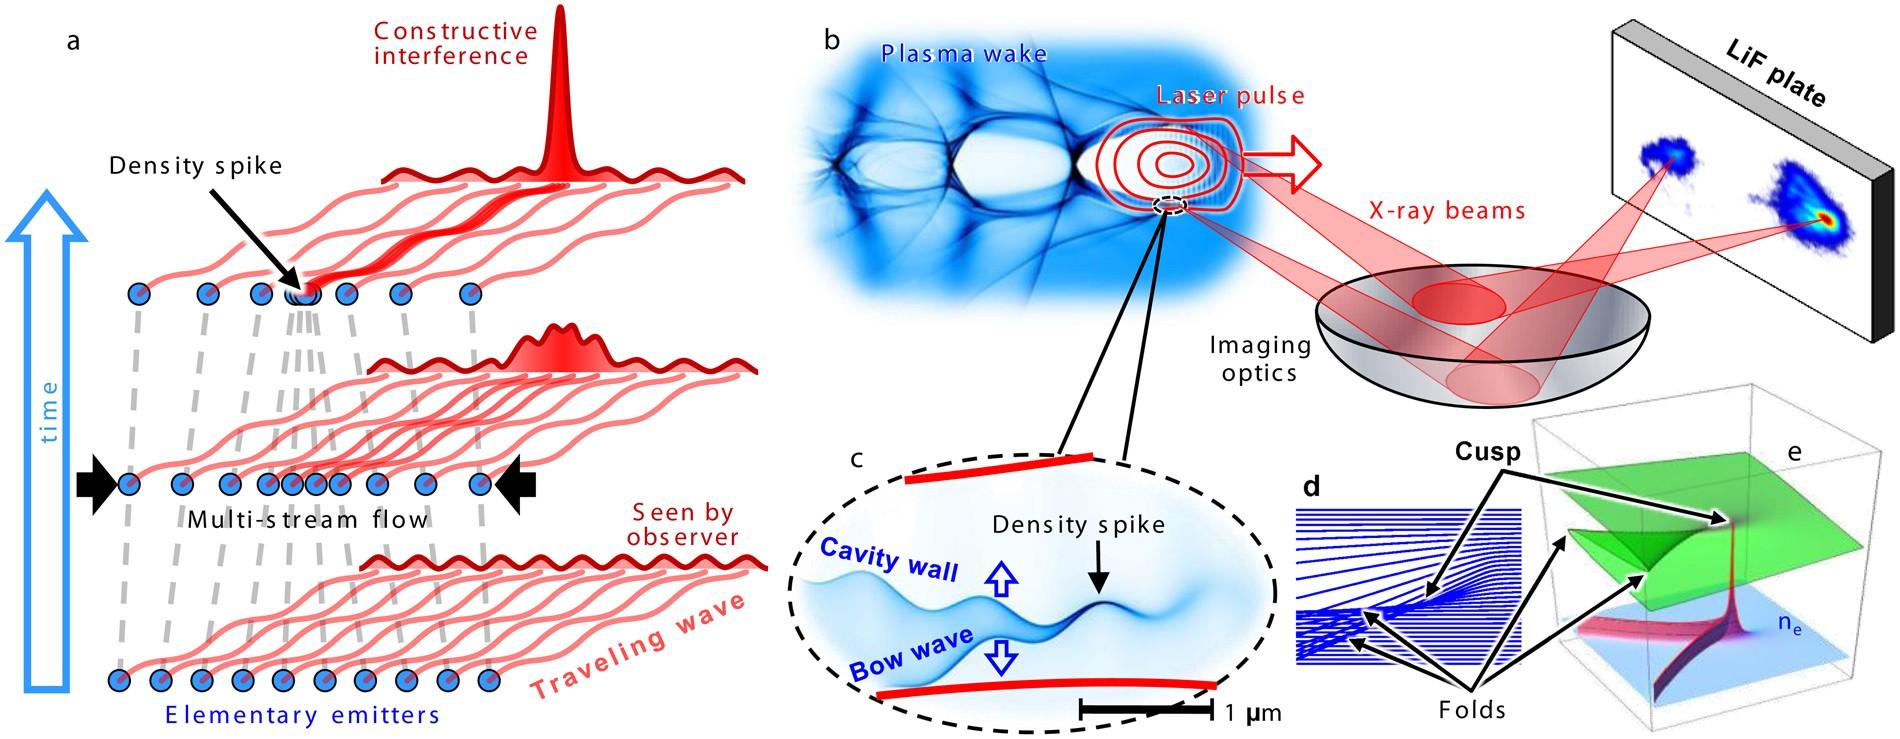 Burst Intensification By Singularity Emitting Radiation In Multi Radio Waves Diagram Showing Flow Of Stream Flows Scientific Reports